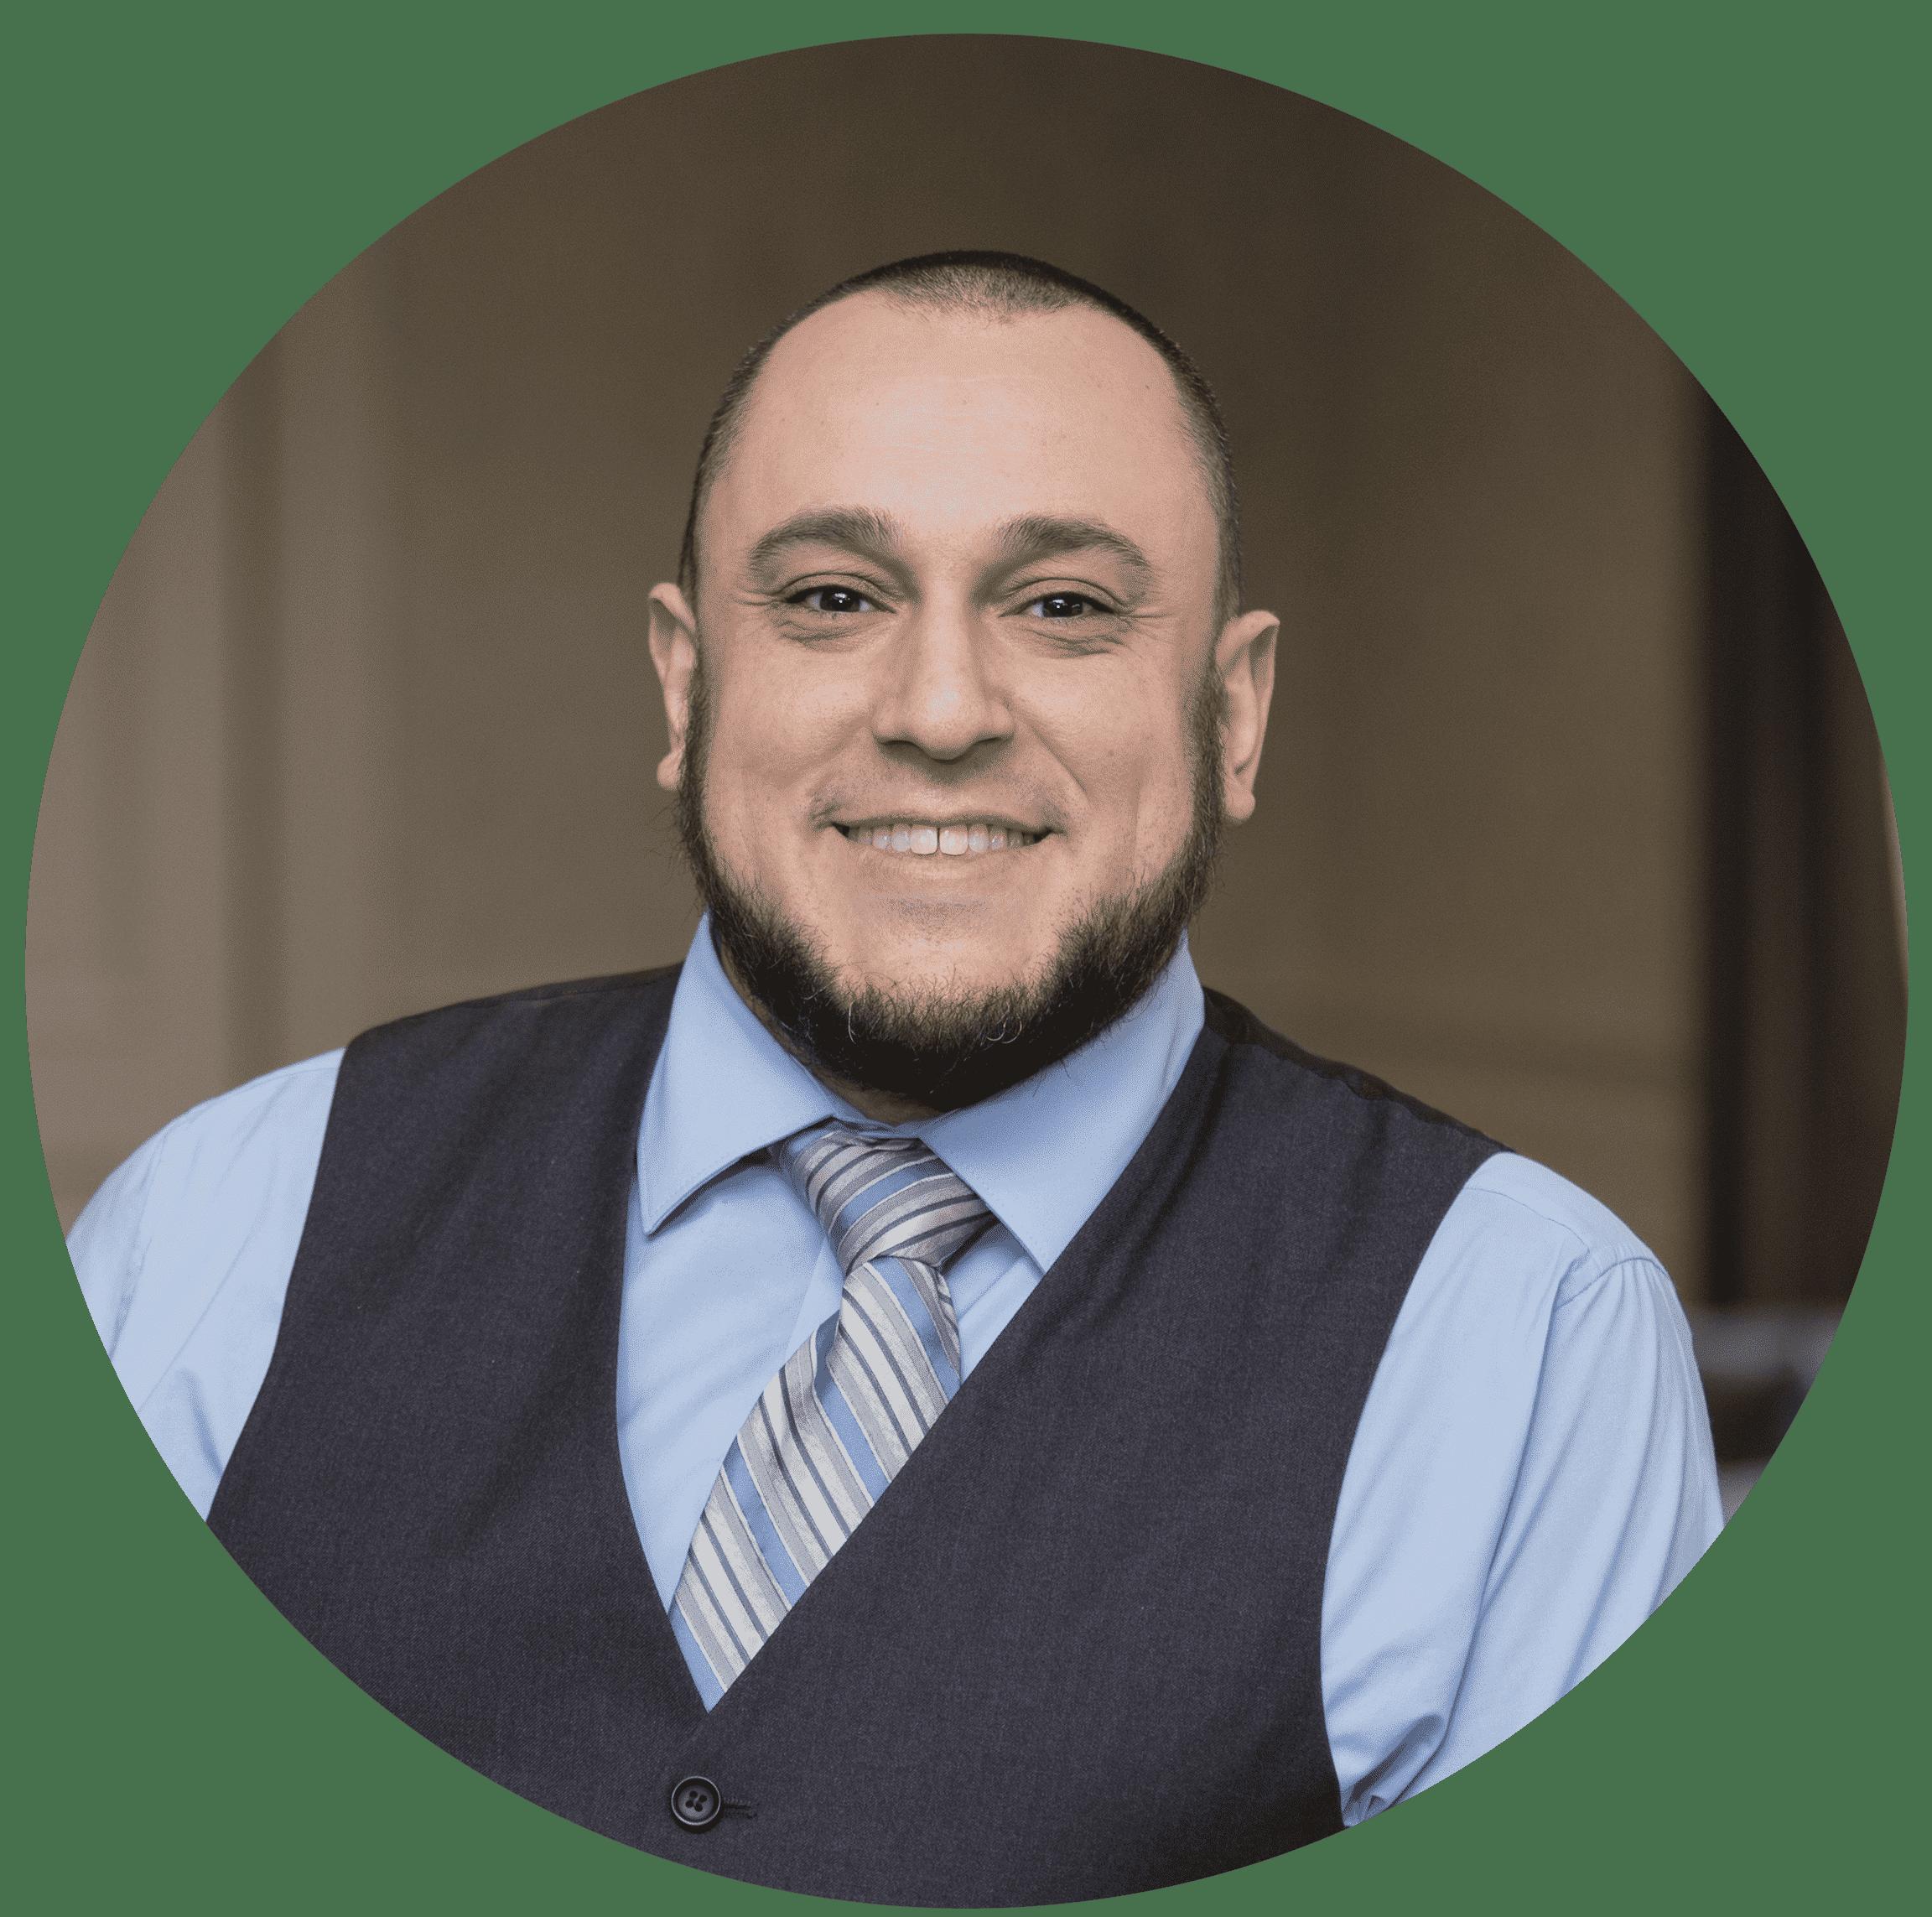 Dave Olinda - DJ / Host